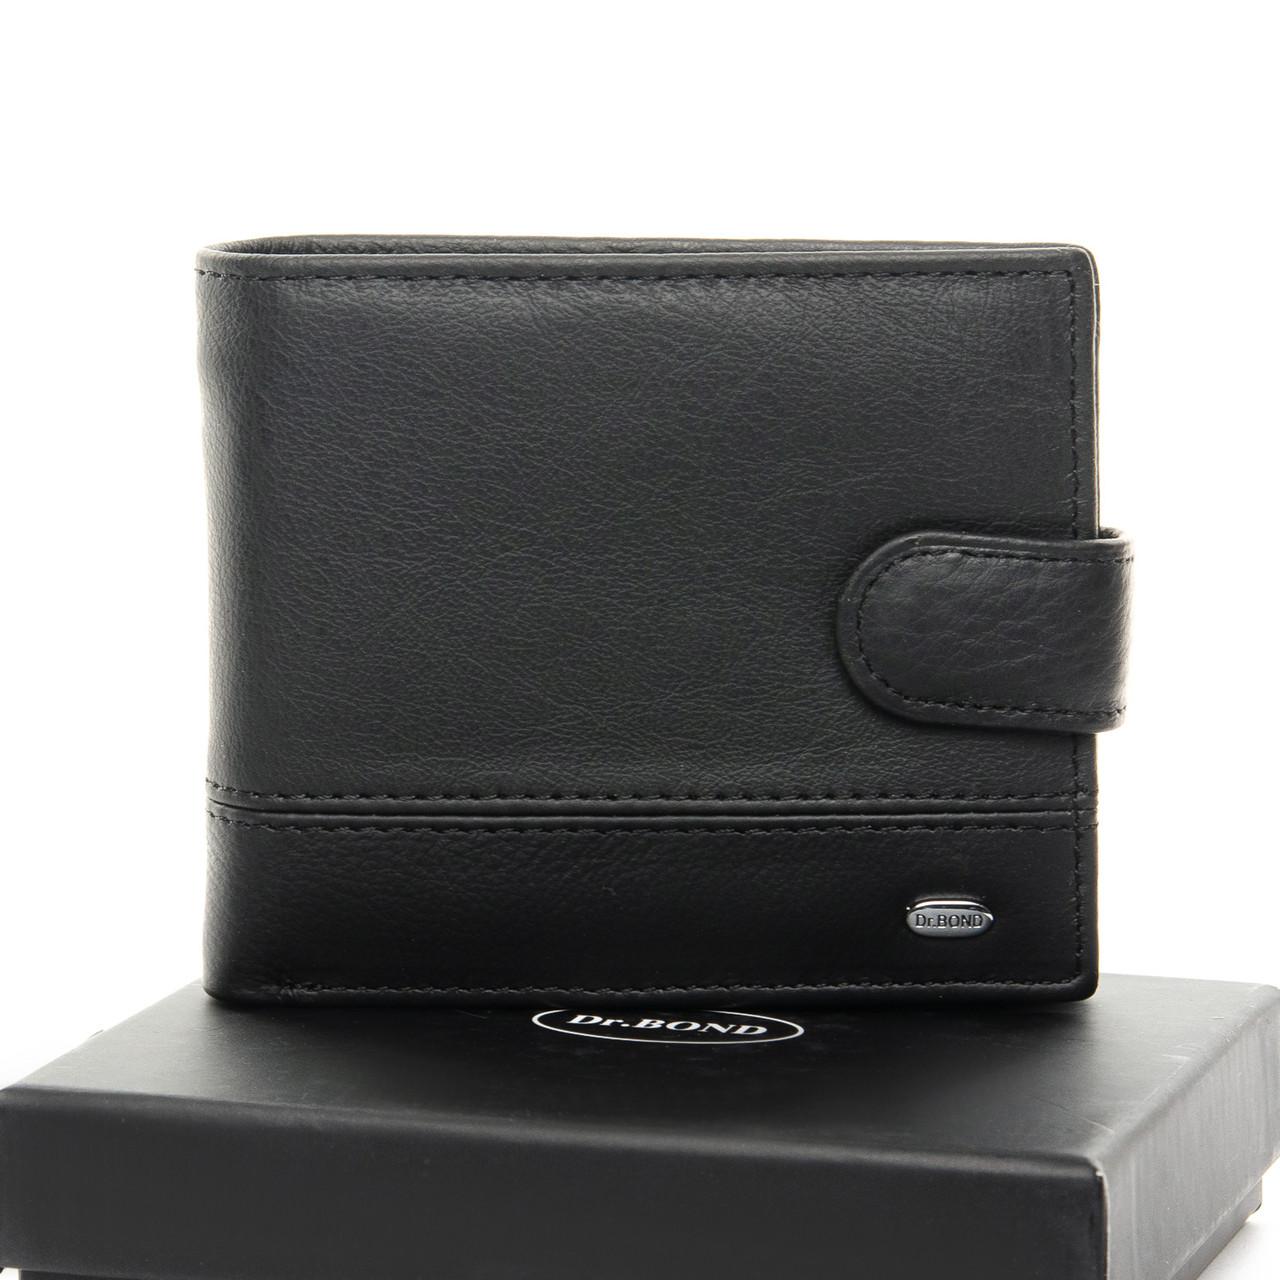 Кошелек Classic кожа DR. BOND M9-1 black